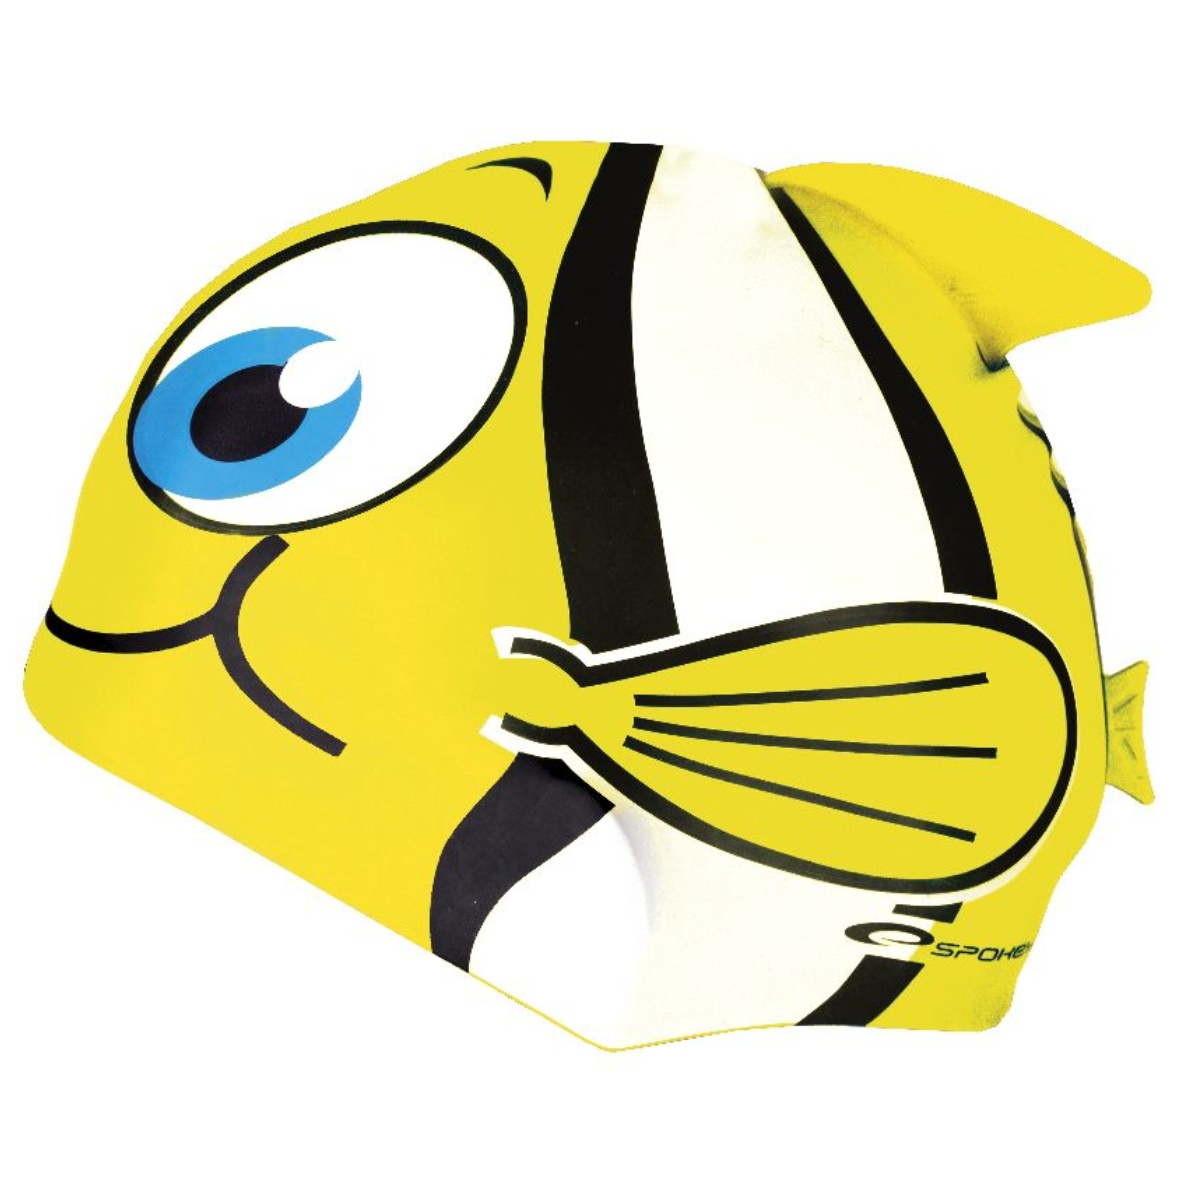 Plavecká čepice SPOKEY Rybka - žlutá